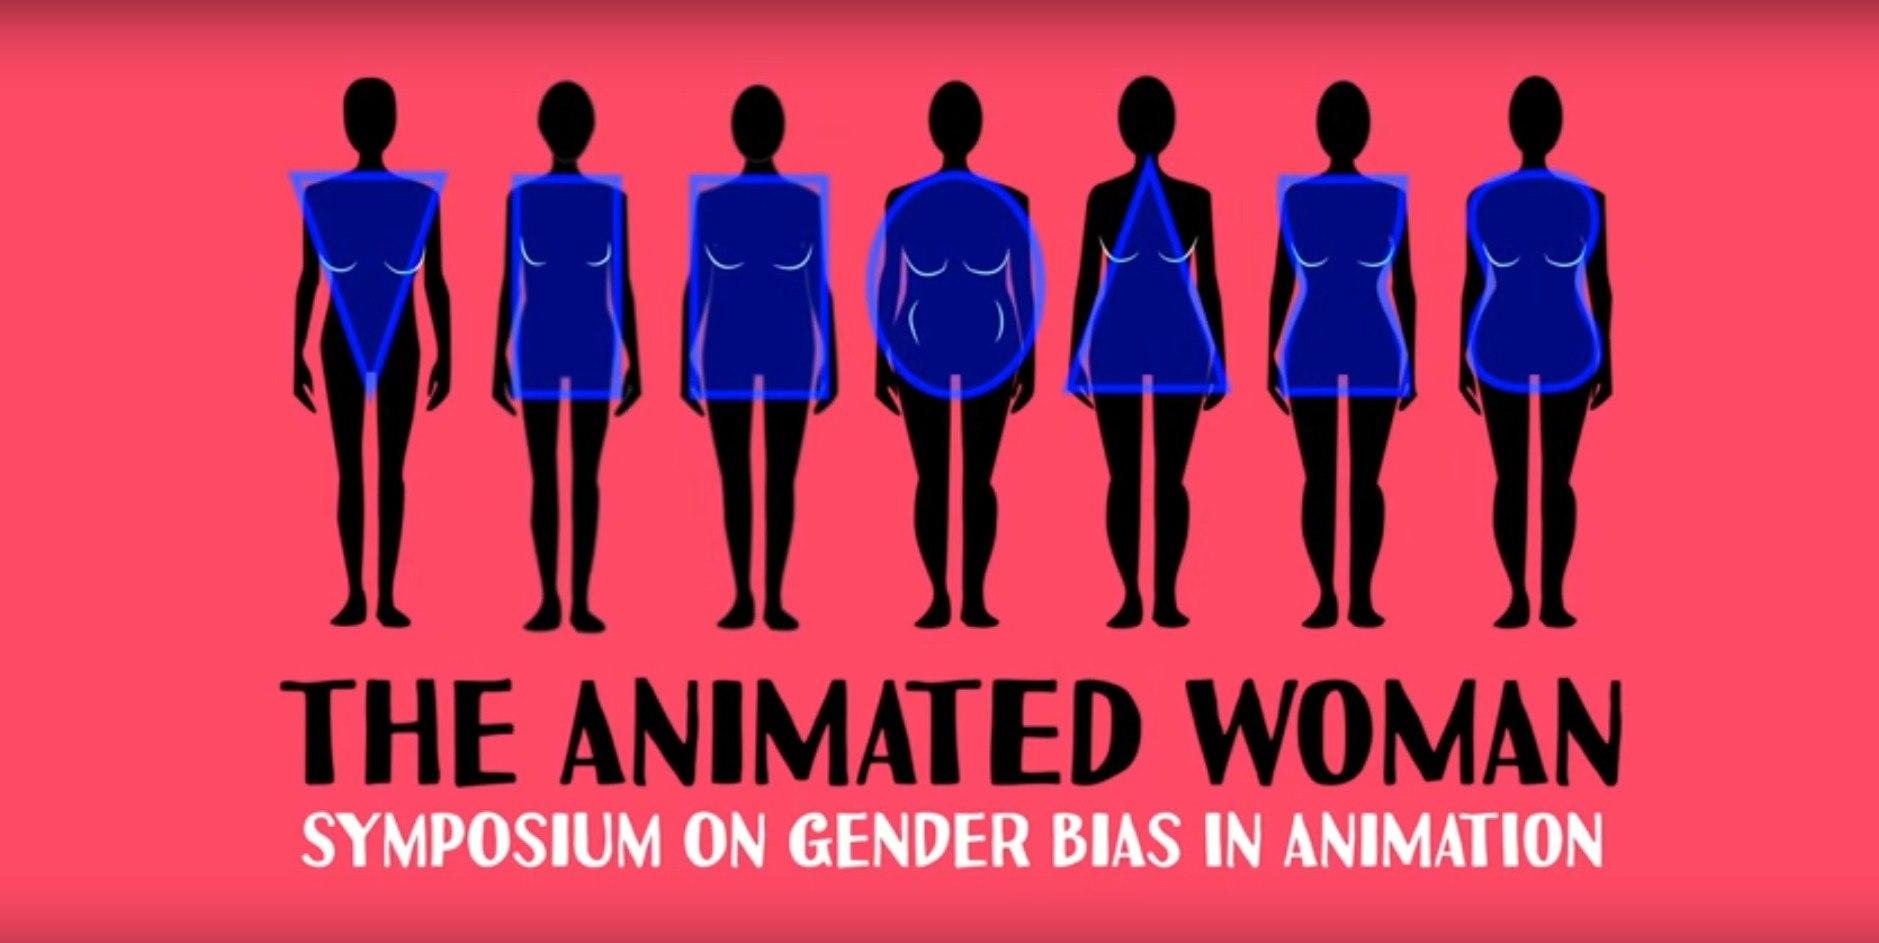 calarts to present second annual symposium on gender bias in